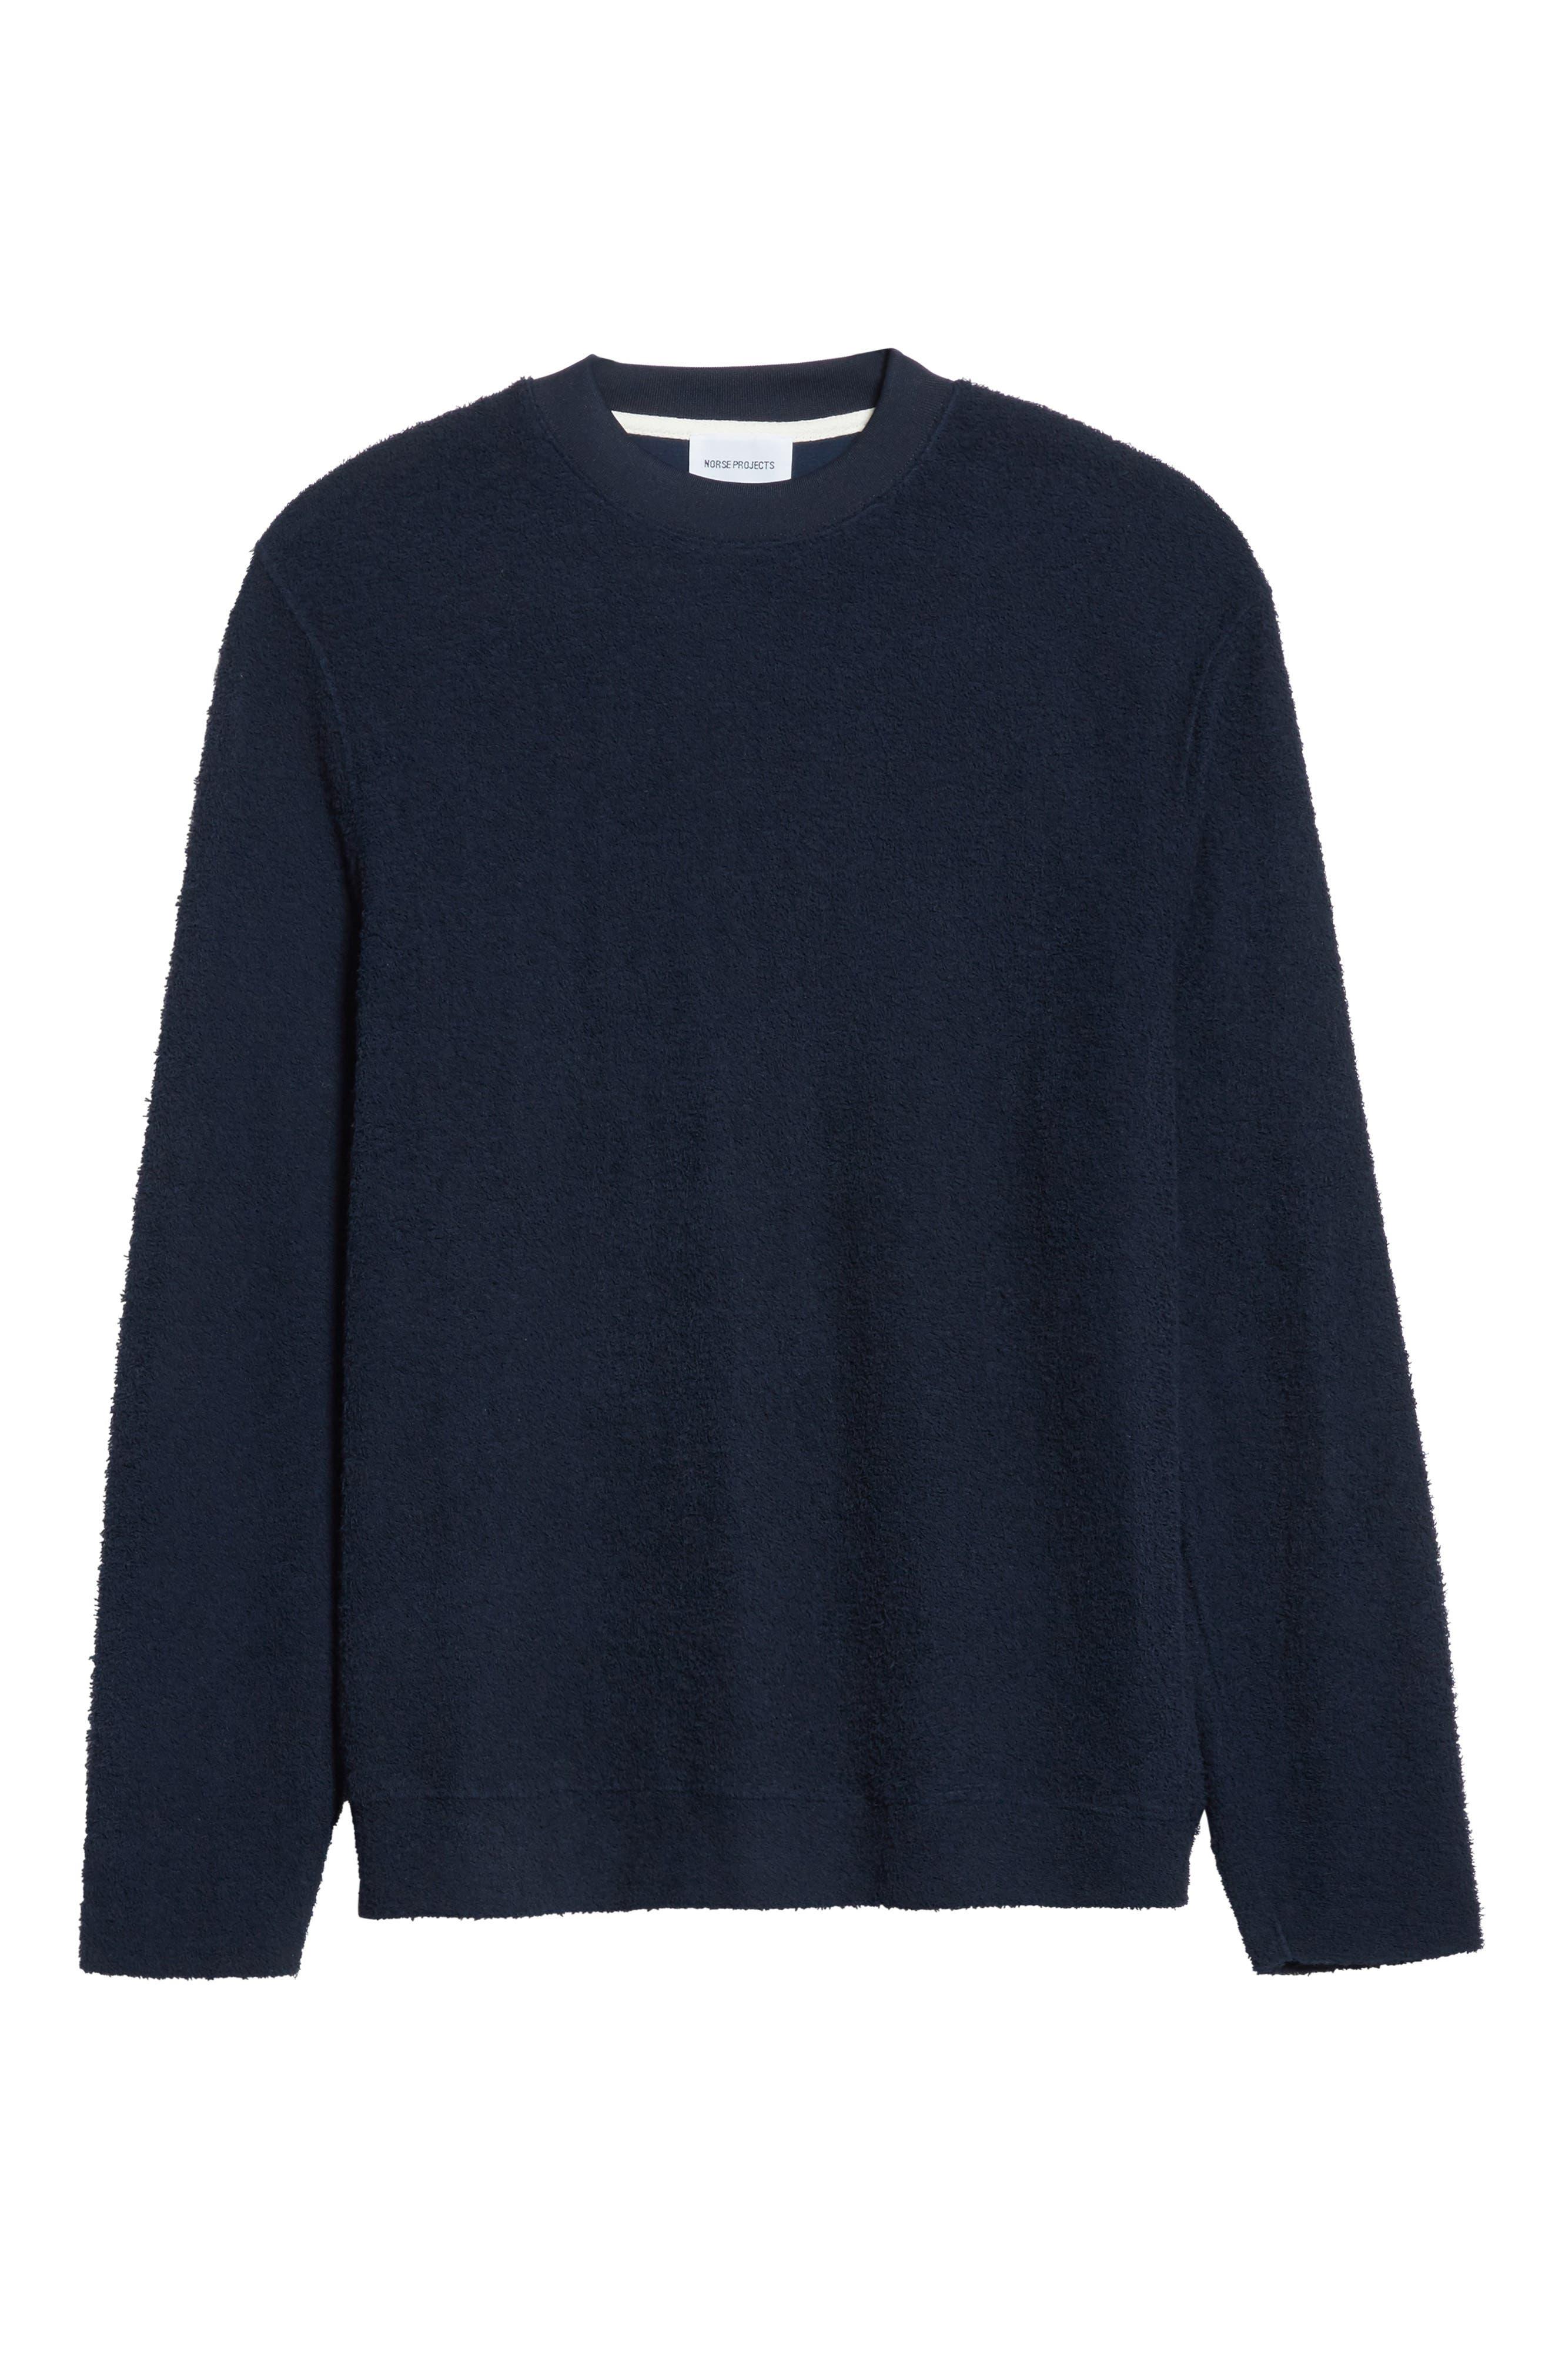 Rask Crewneck Sweatshirt,                             Alternate thumbnail 6, color,                             Dark Navy